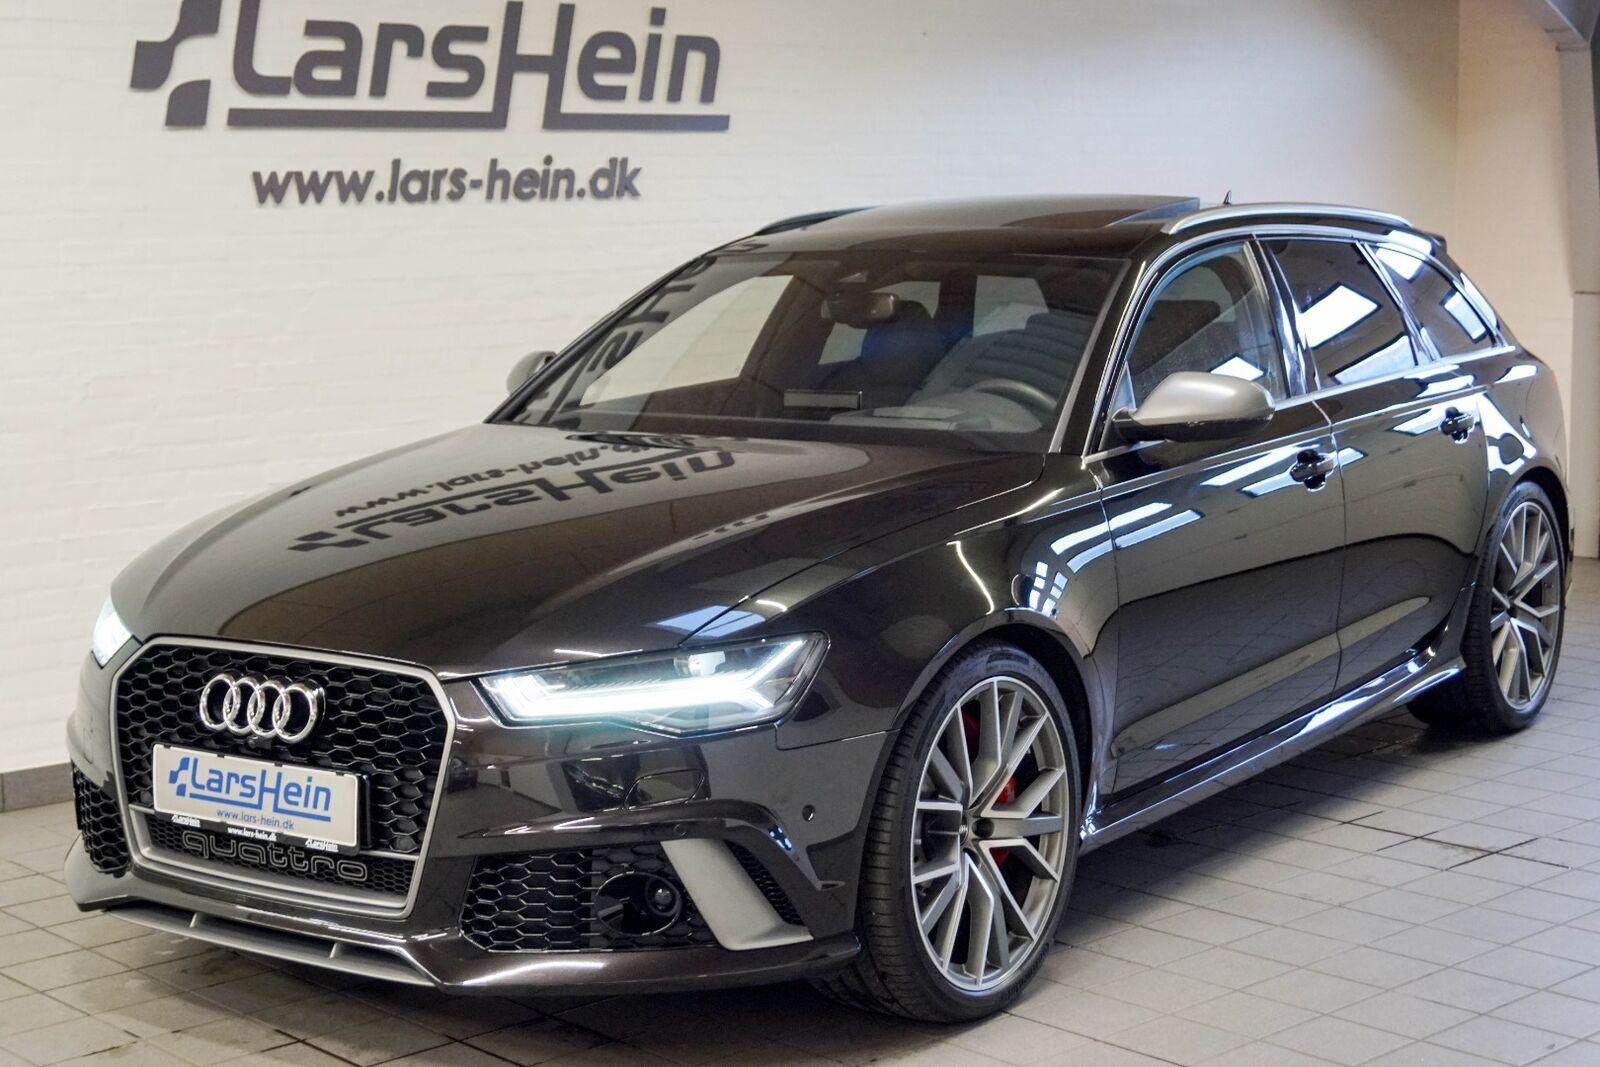 Audi RS6 4,0 TFSi performance Avant quattro 5d